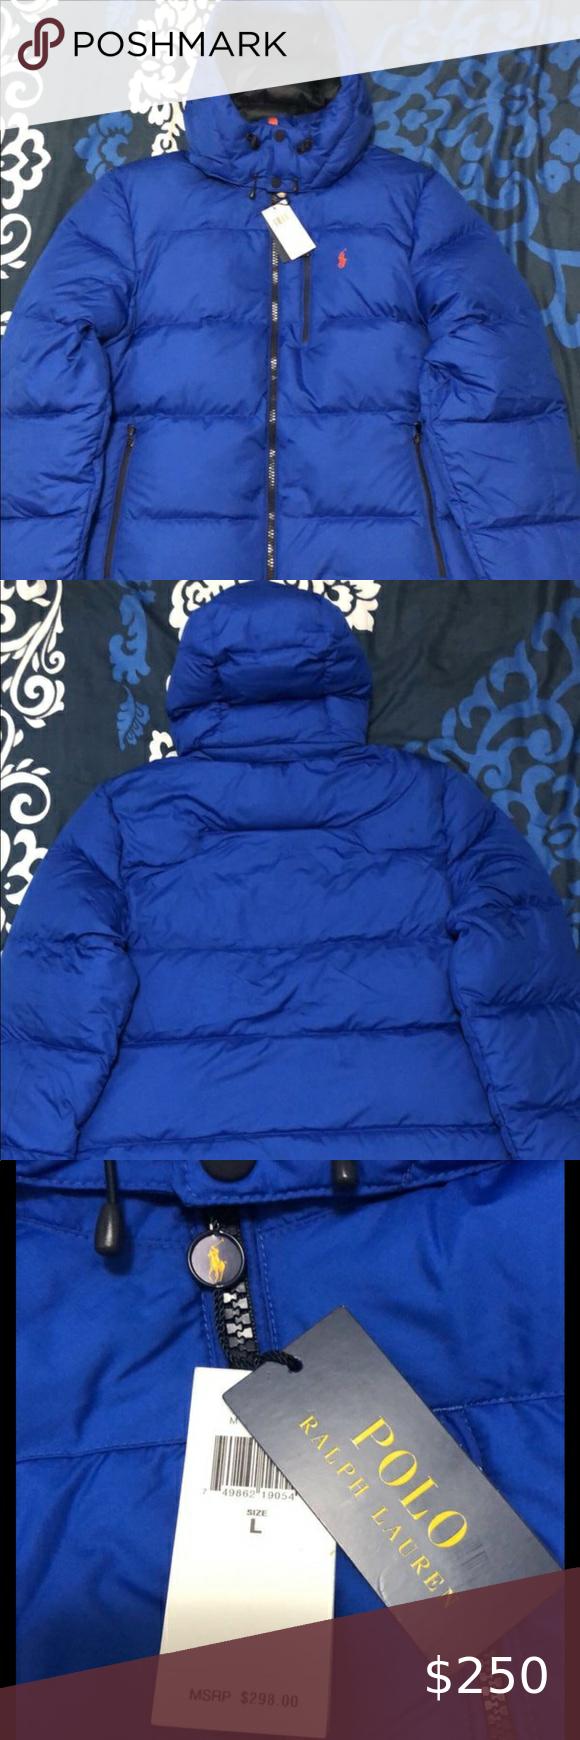 Polo Ralph Lauren Winter Jacket Winter Jackets Polo Ralph Lauren Ralph Lauren Jackets [ 1740 x 580 Pixel ]